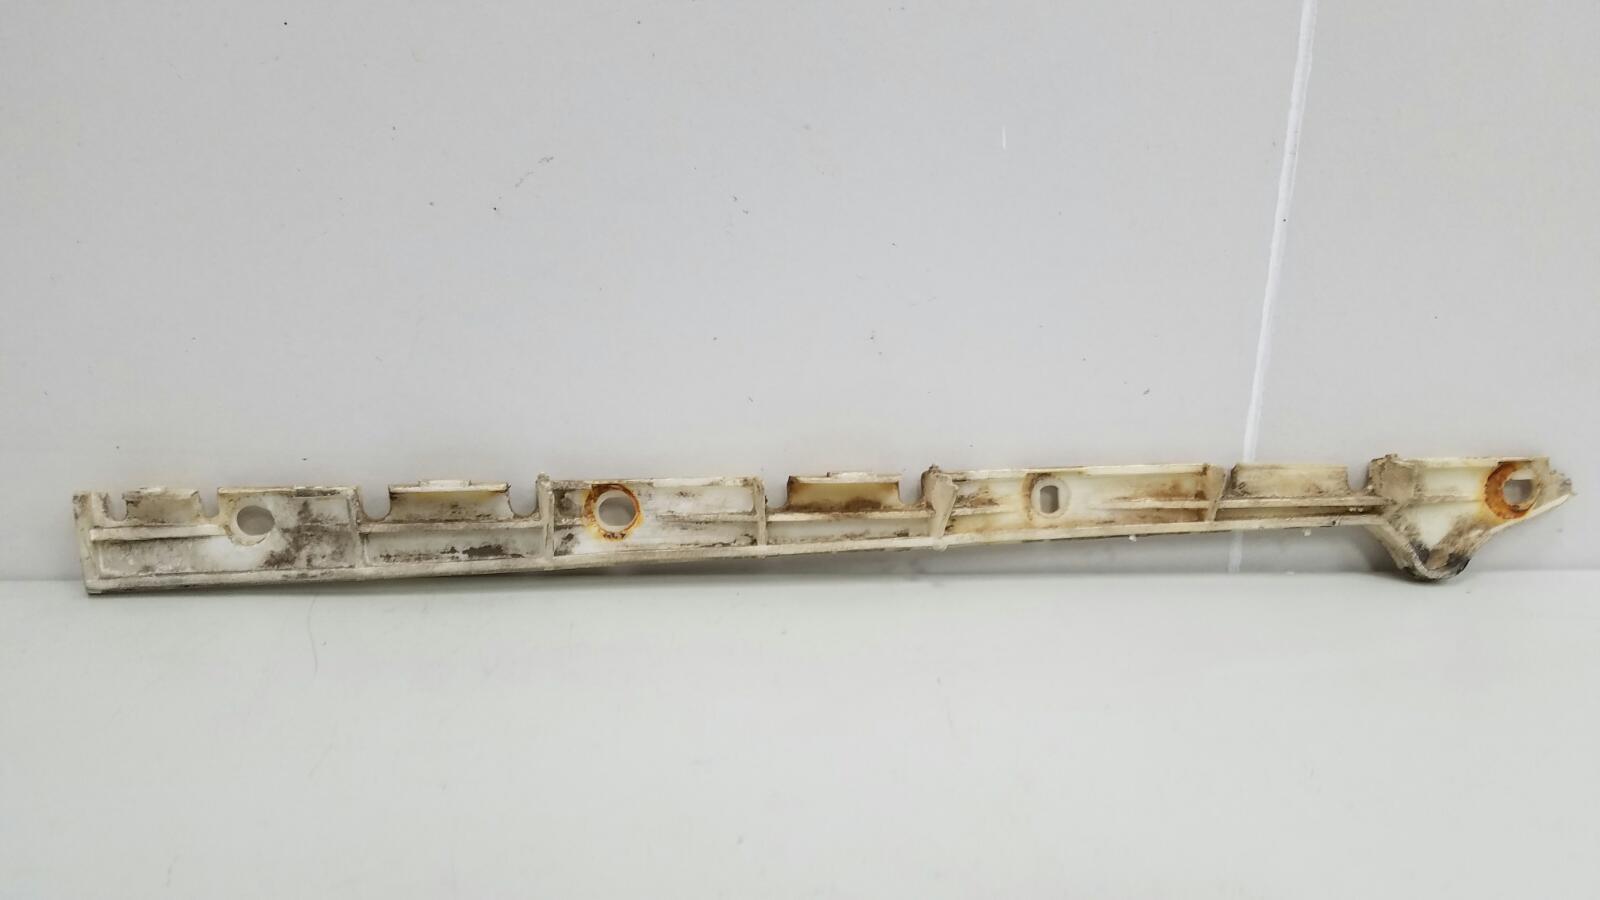 Кронштейн крепление бампера Rover 75 RJ 18K4F 1.8Л 2000 задний правый